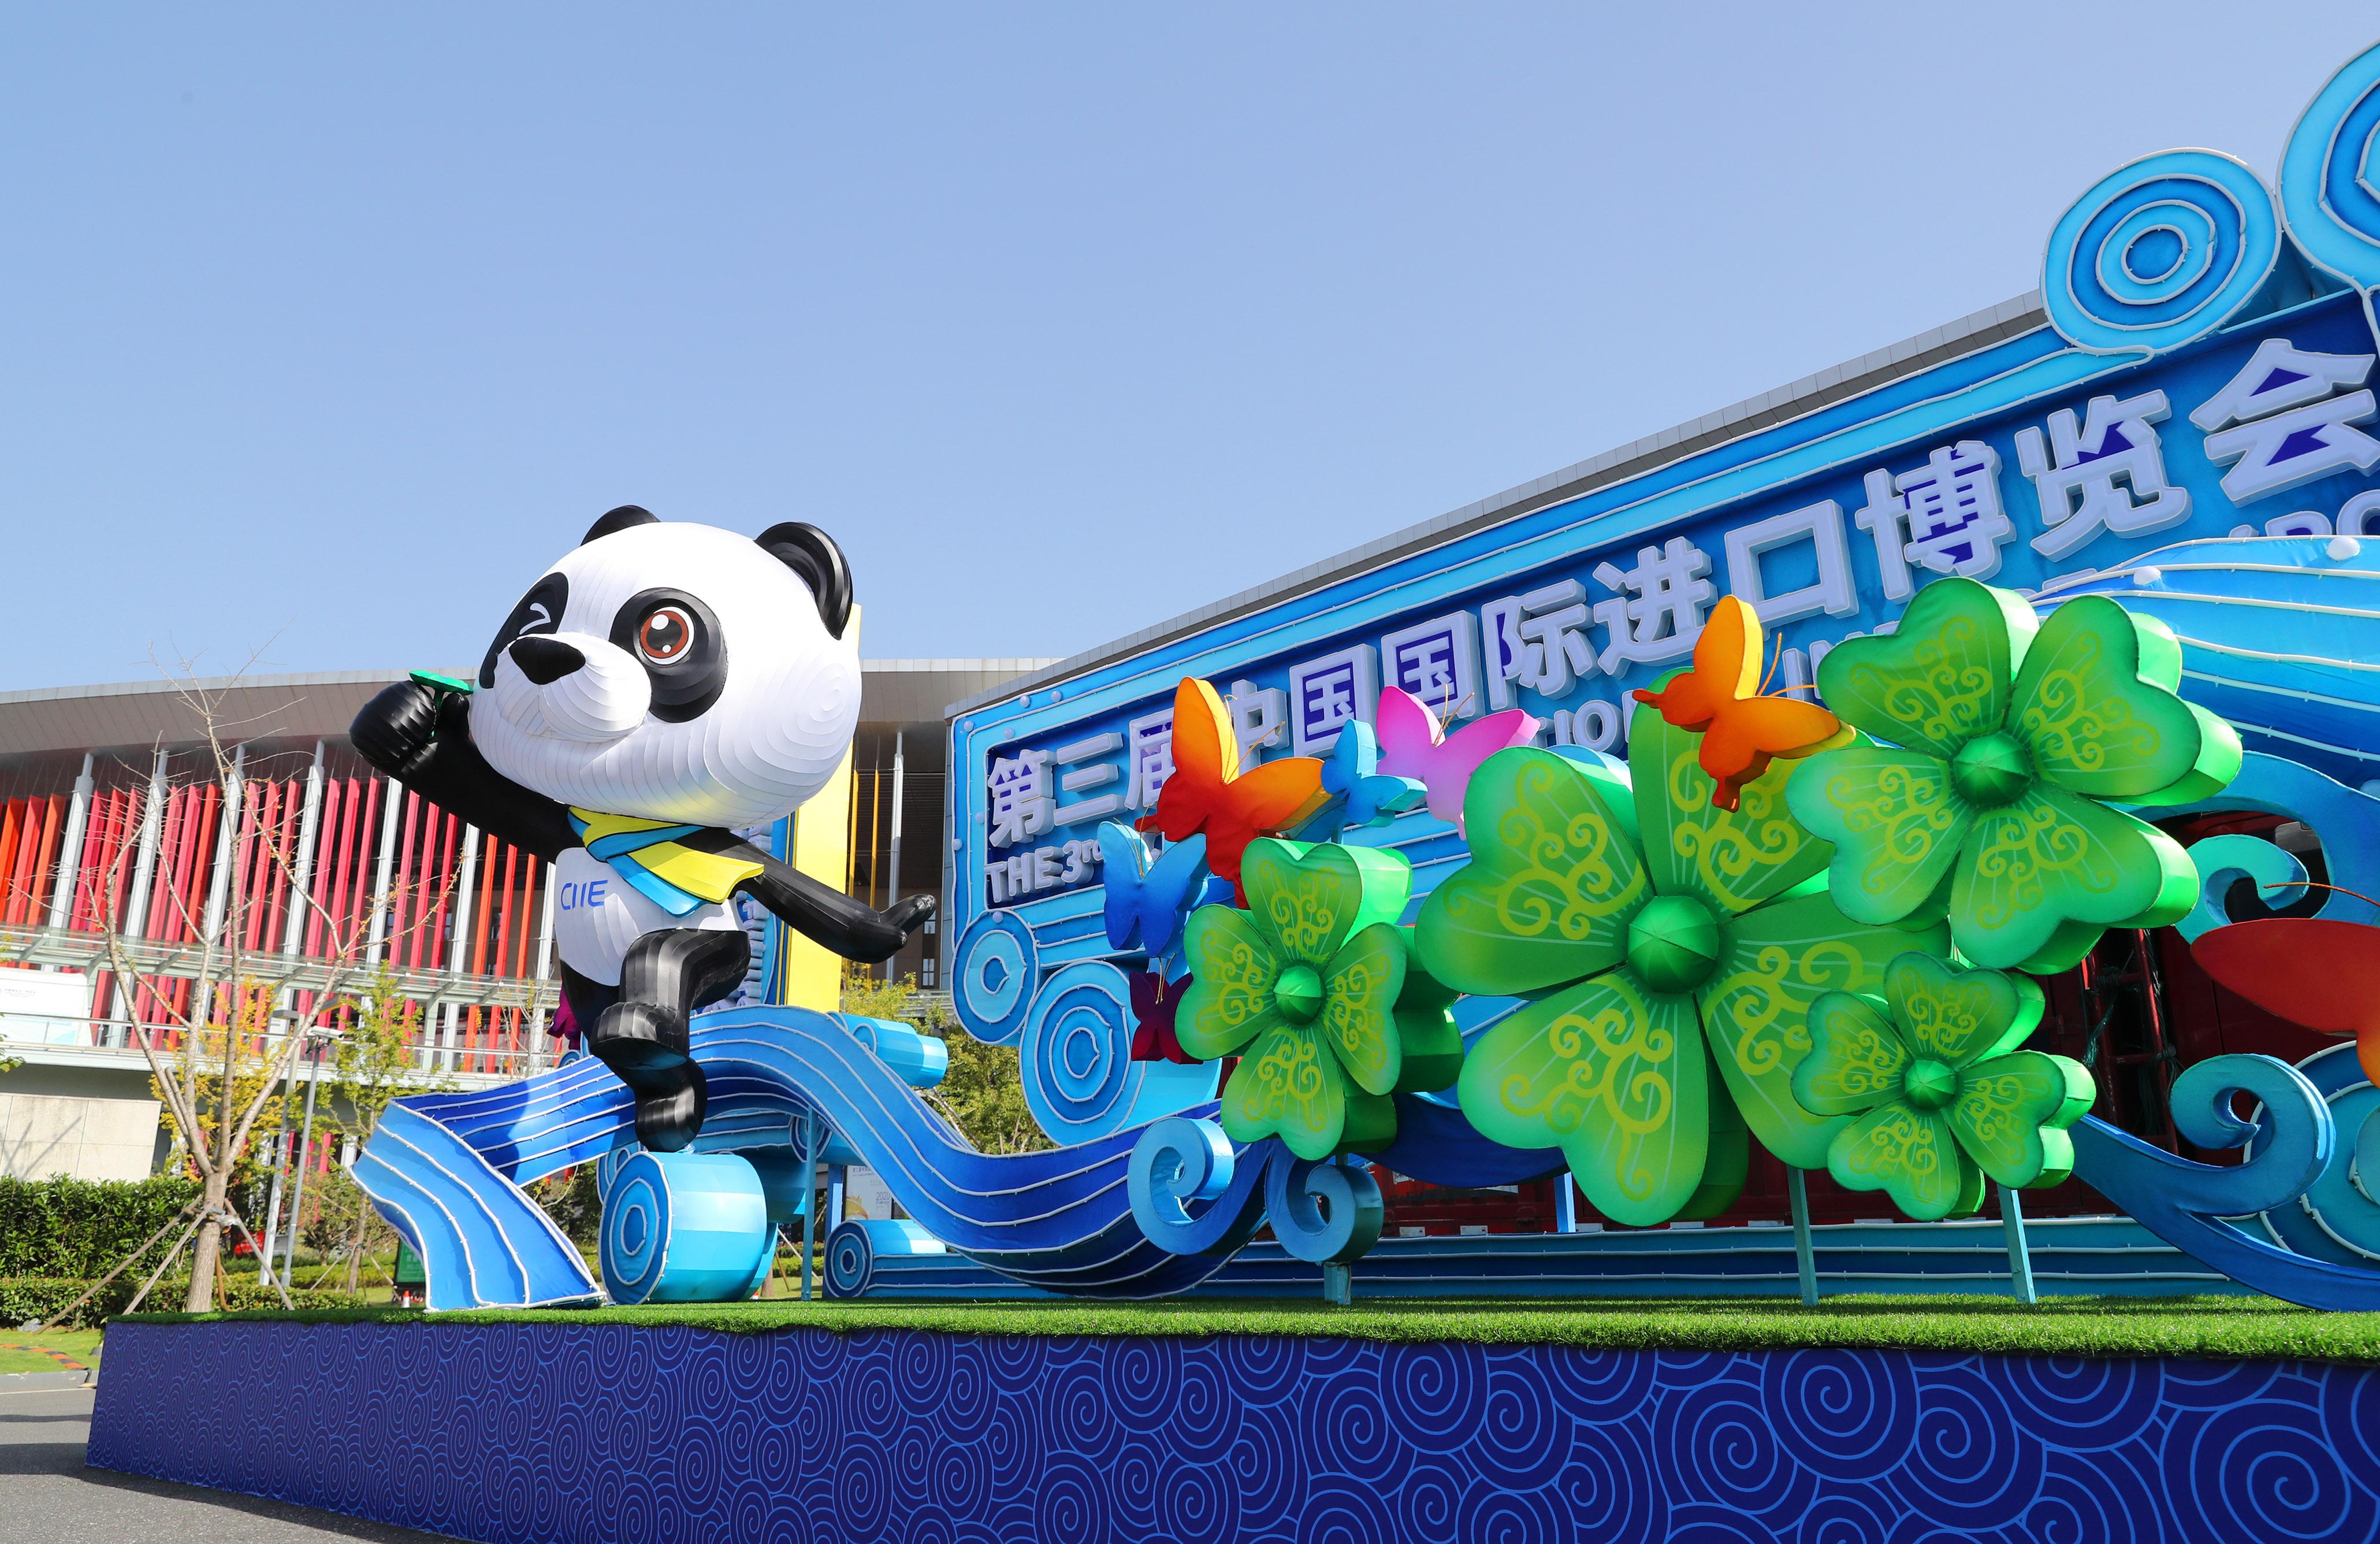 第3回輸入博の開幕間近 会場準備着々と 上海市